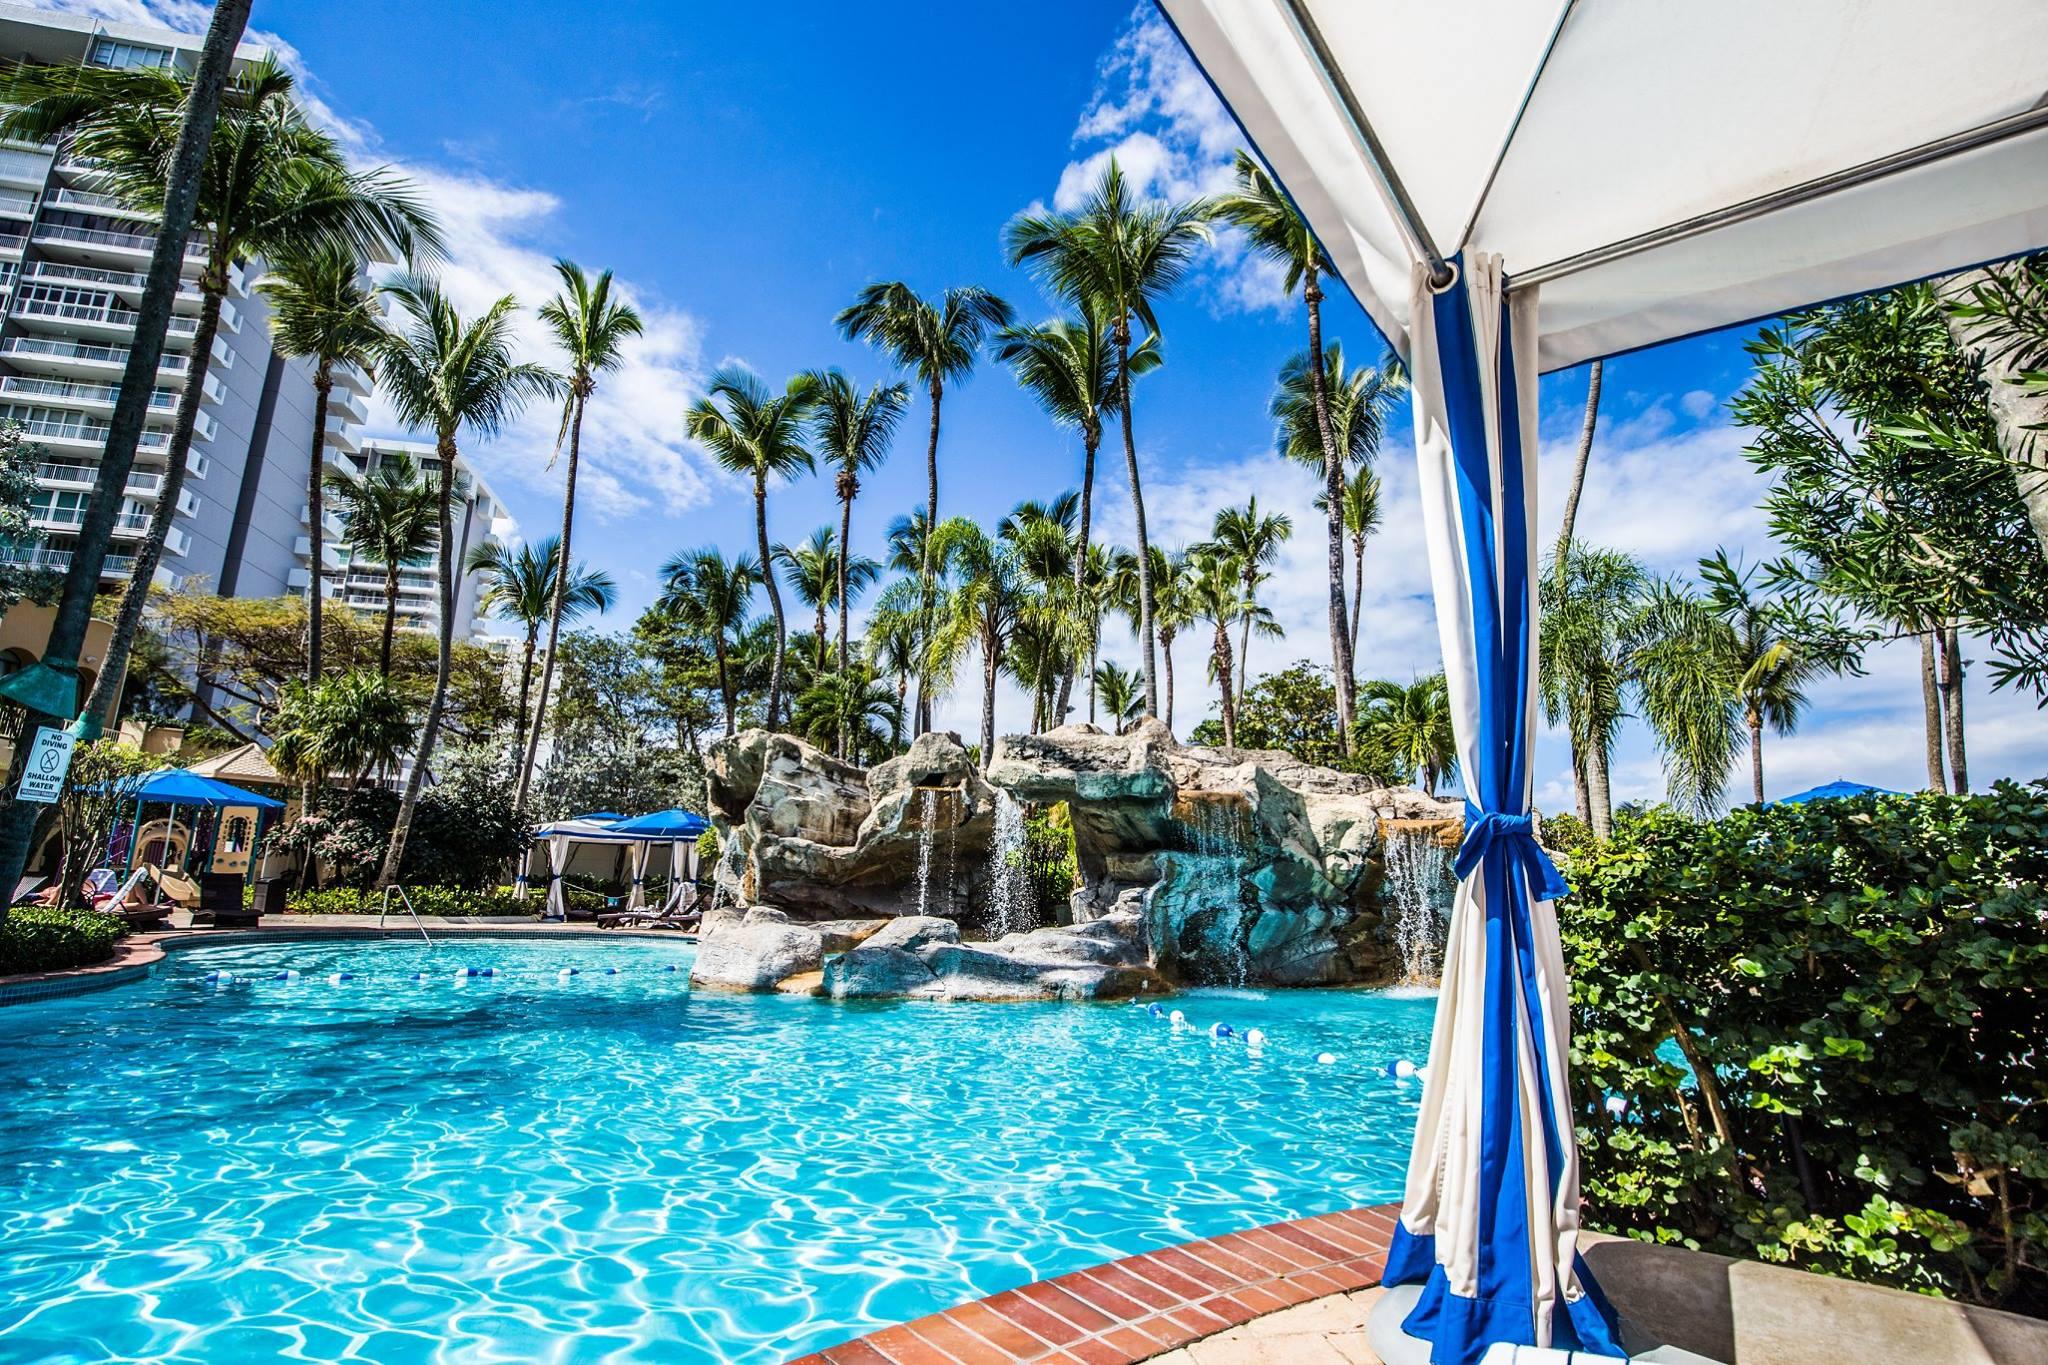 Intercontinental san juan resort /u0026 casino puerto rico where to buy hd pvr 2 gaming edition